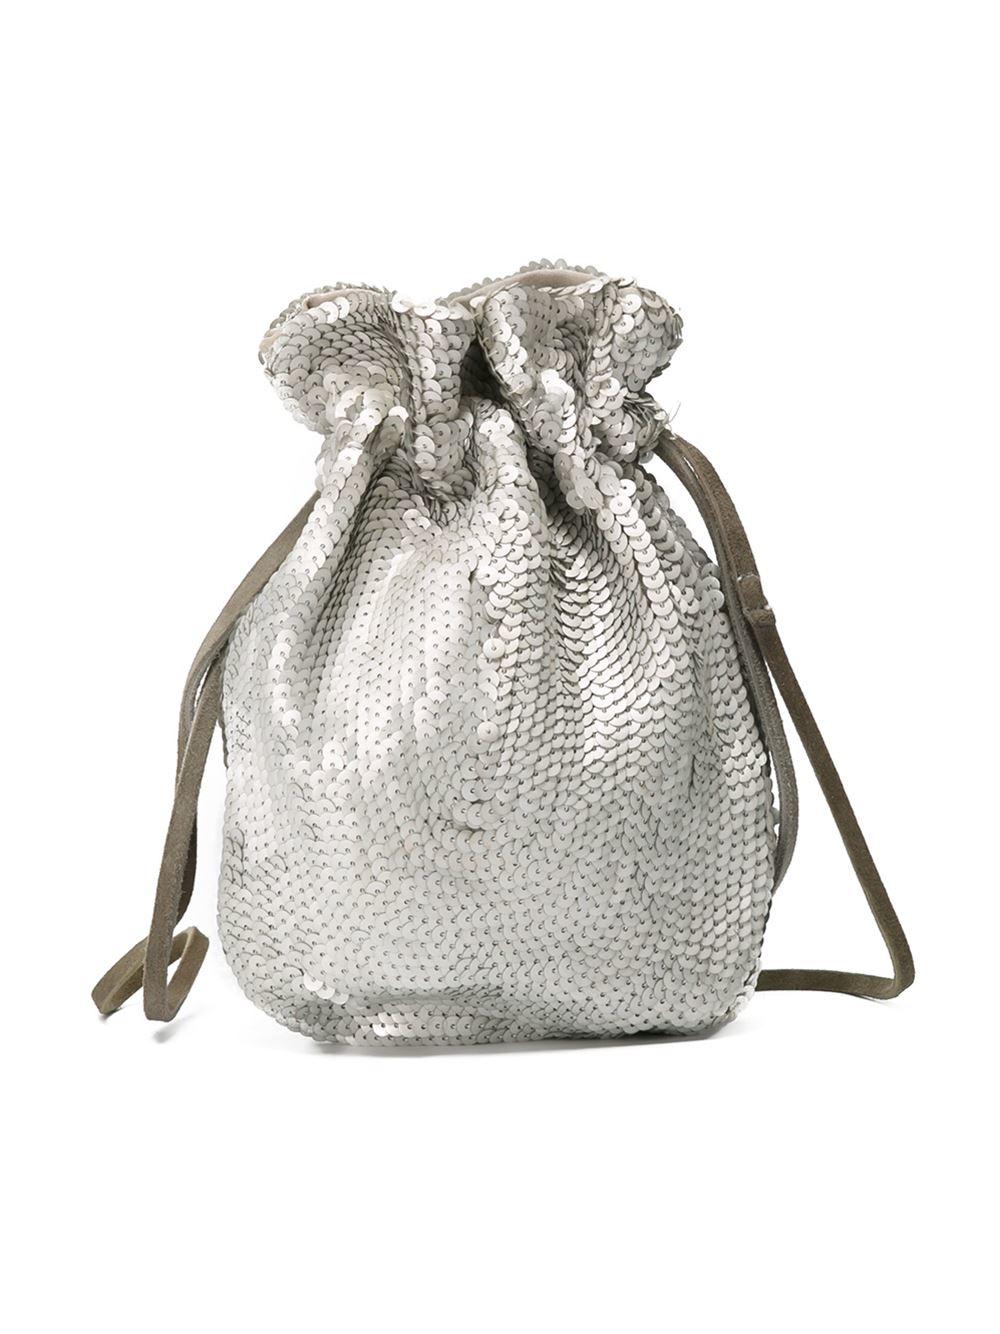 Prada Sequin Drawstring Bag in Metallic | Lyst